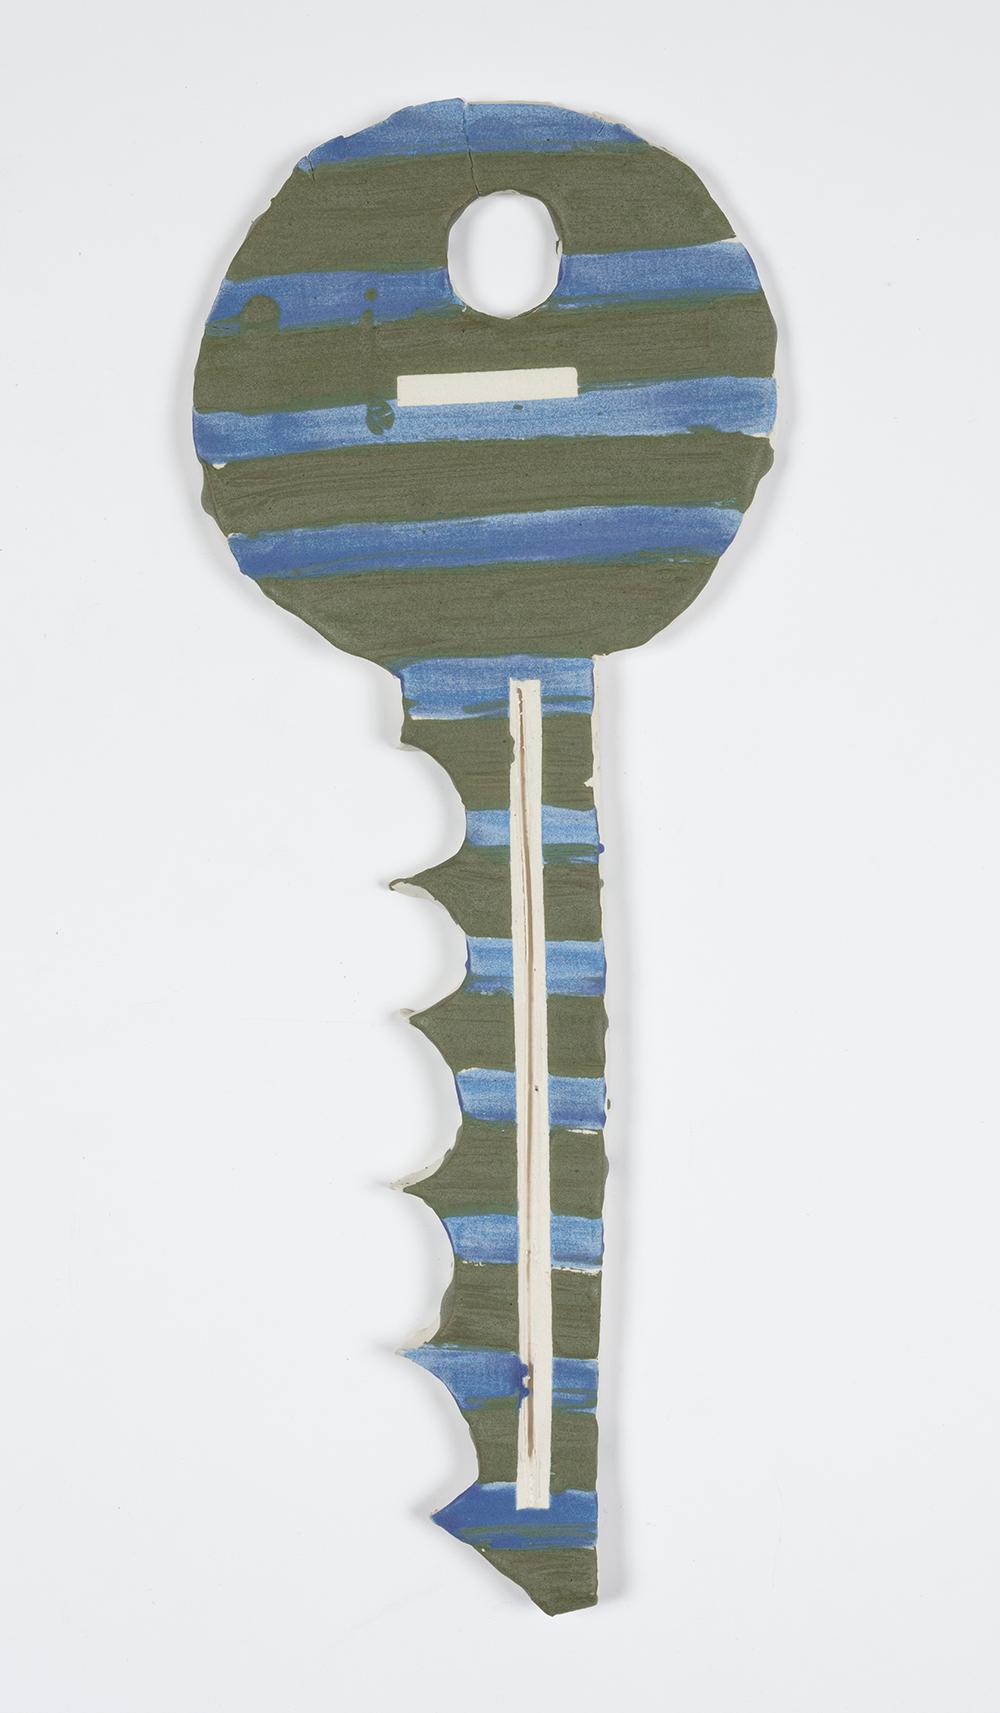 Kevin McNamee-Tweed.<em> Ash Blue Key</em>, 2019. Glazed ceramic, 19 1/2 x 8 inches (49.5 x 20.3 cm)